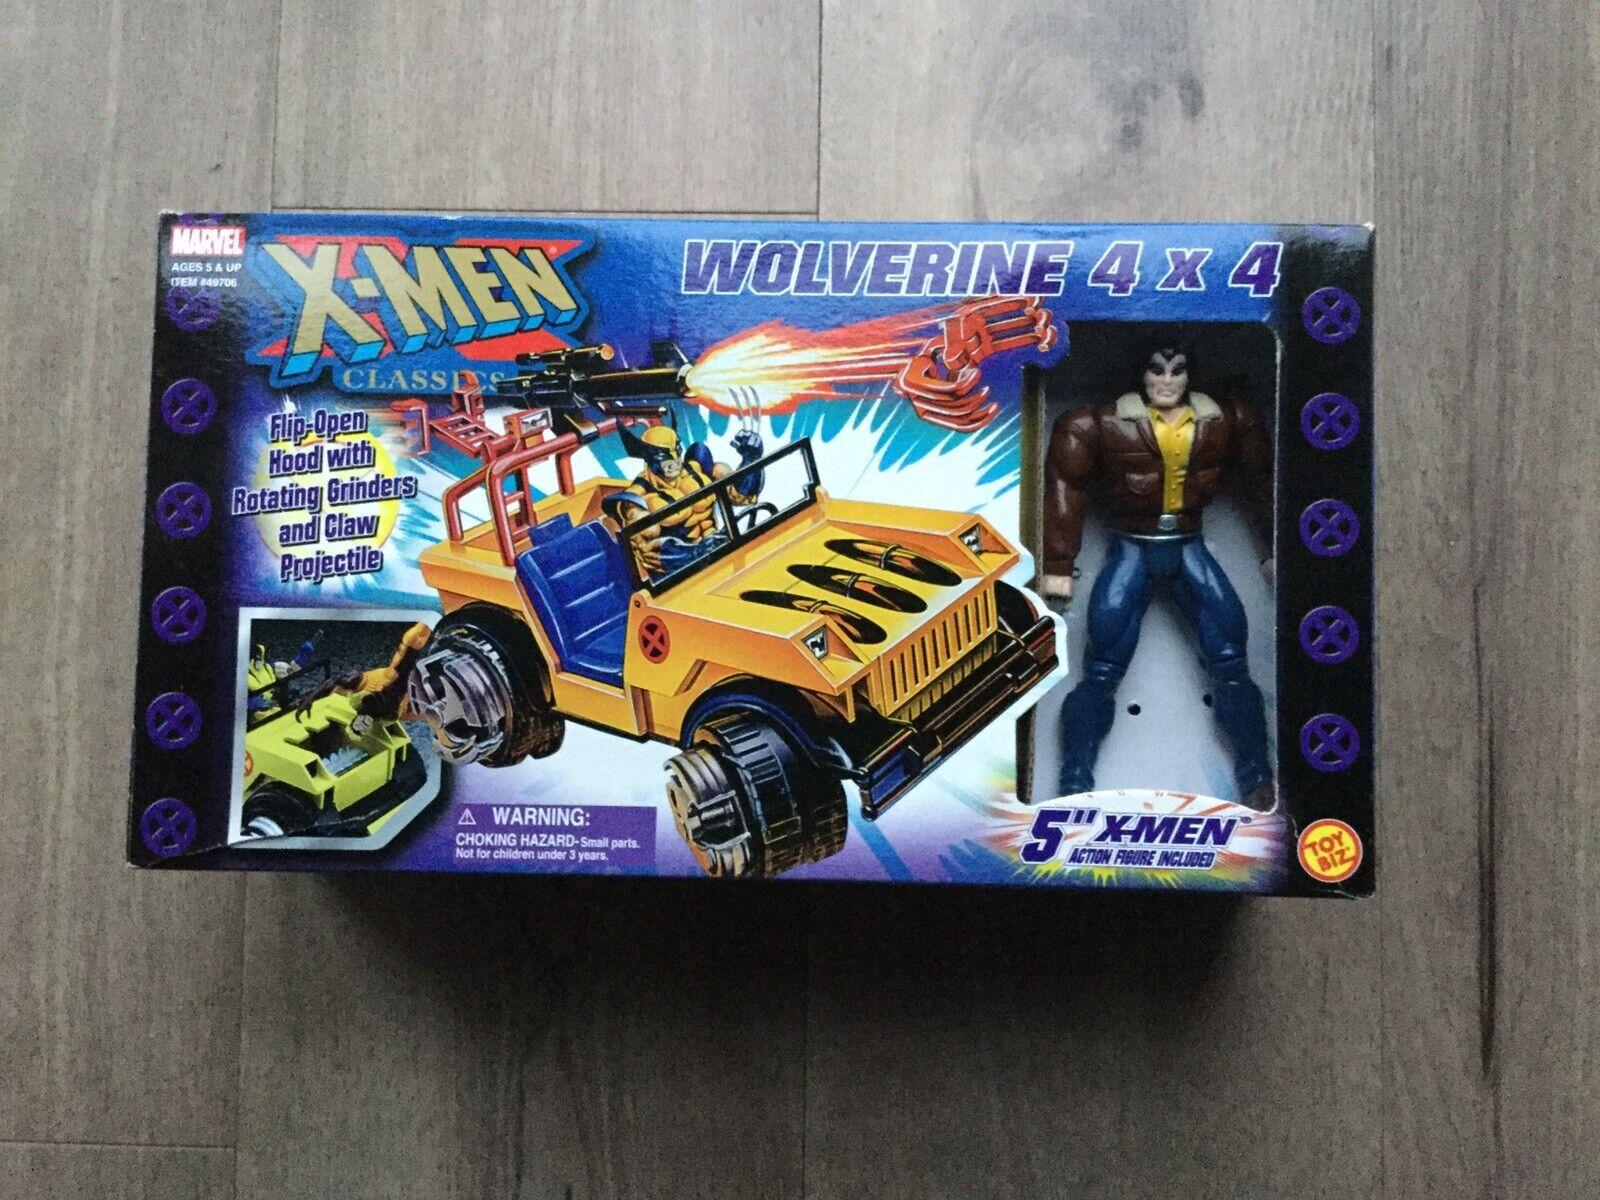 2000 ToyBiz X-Men Classics Figure - Wolverine 4x4 Jeep Toy